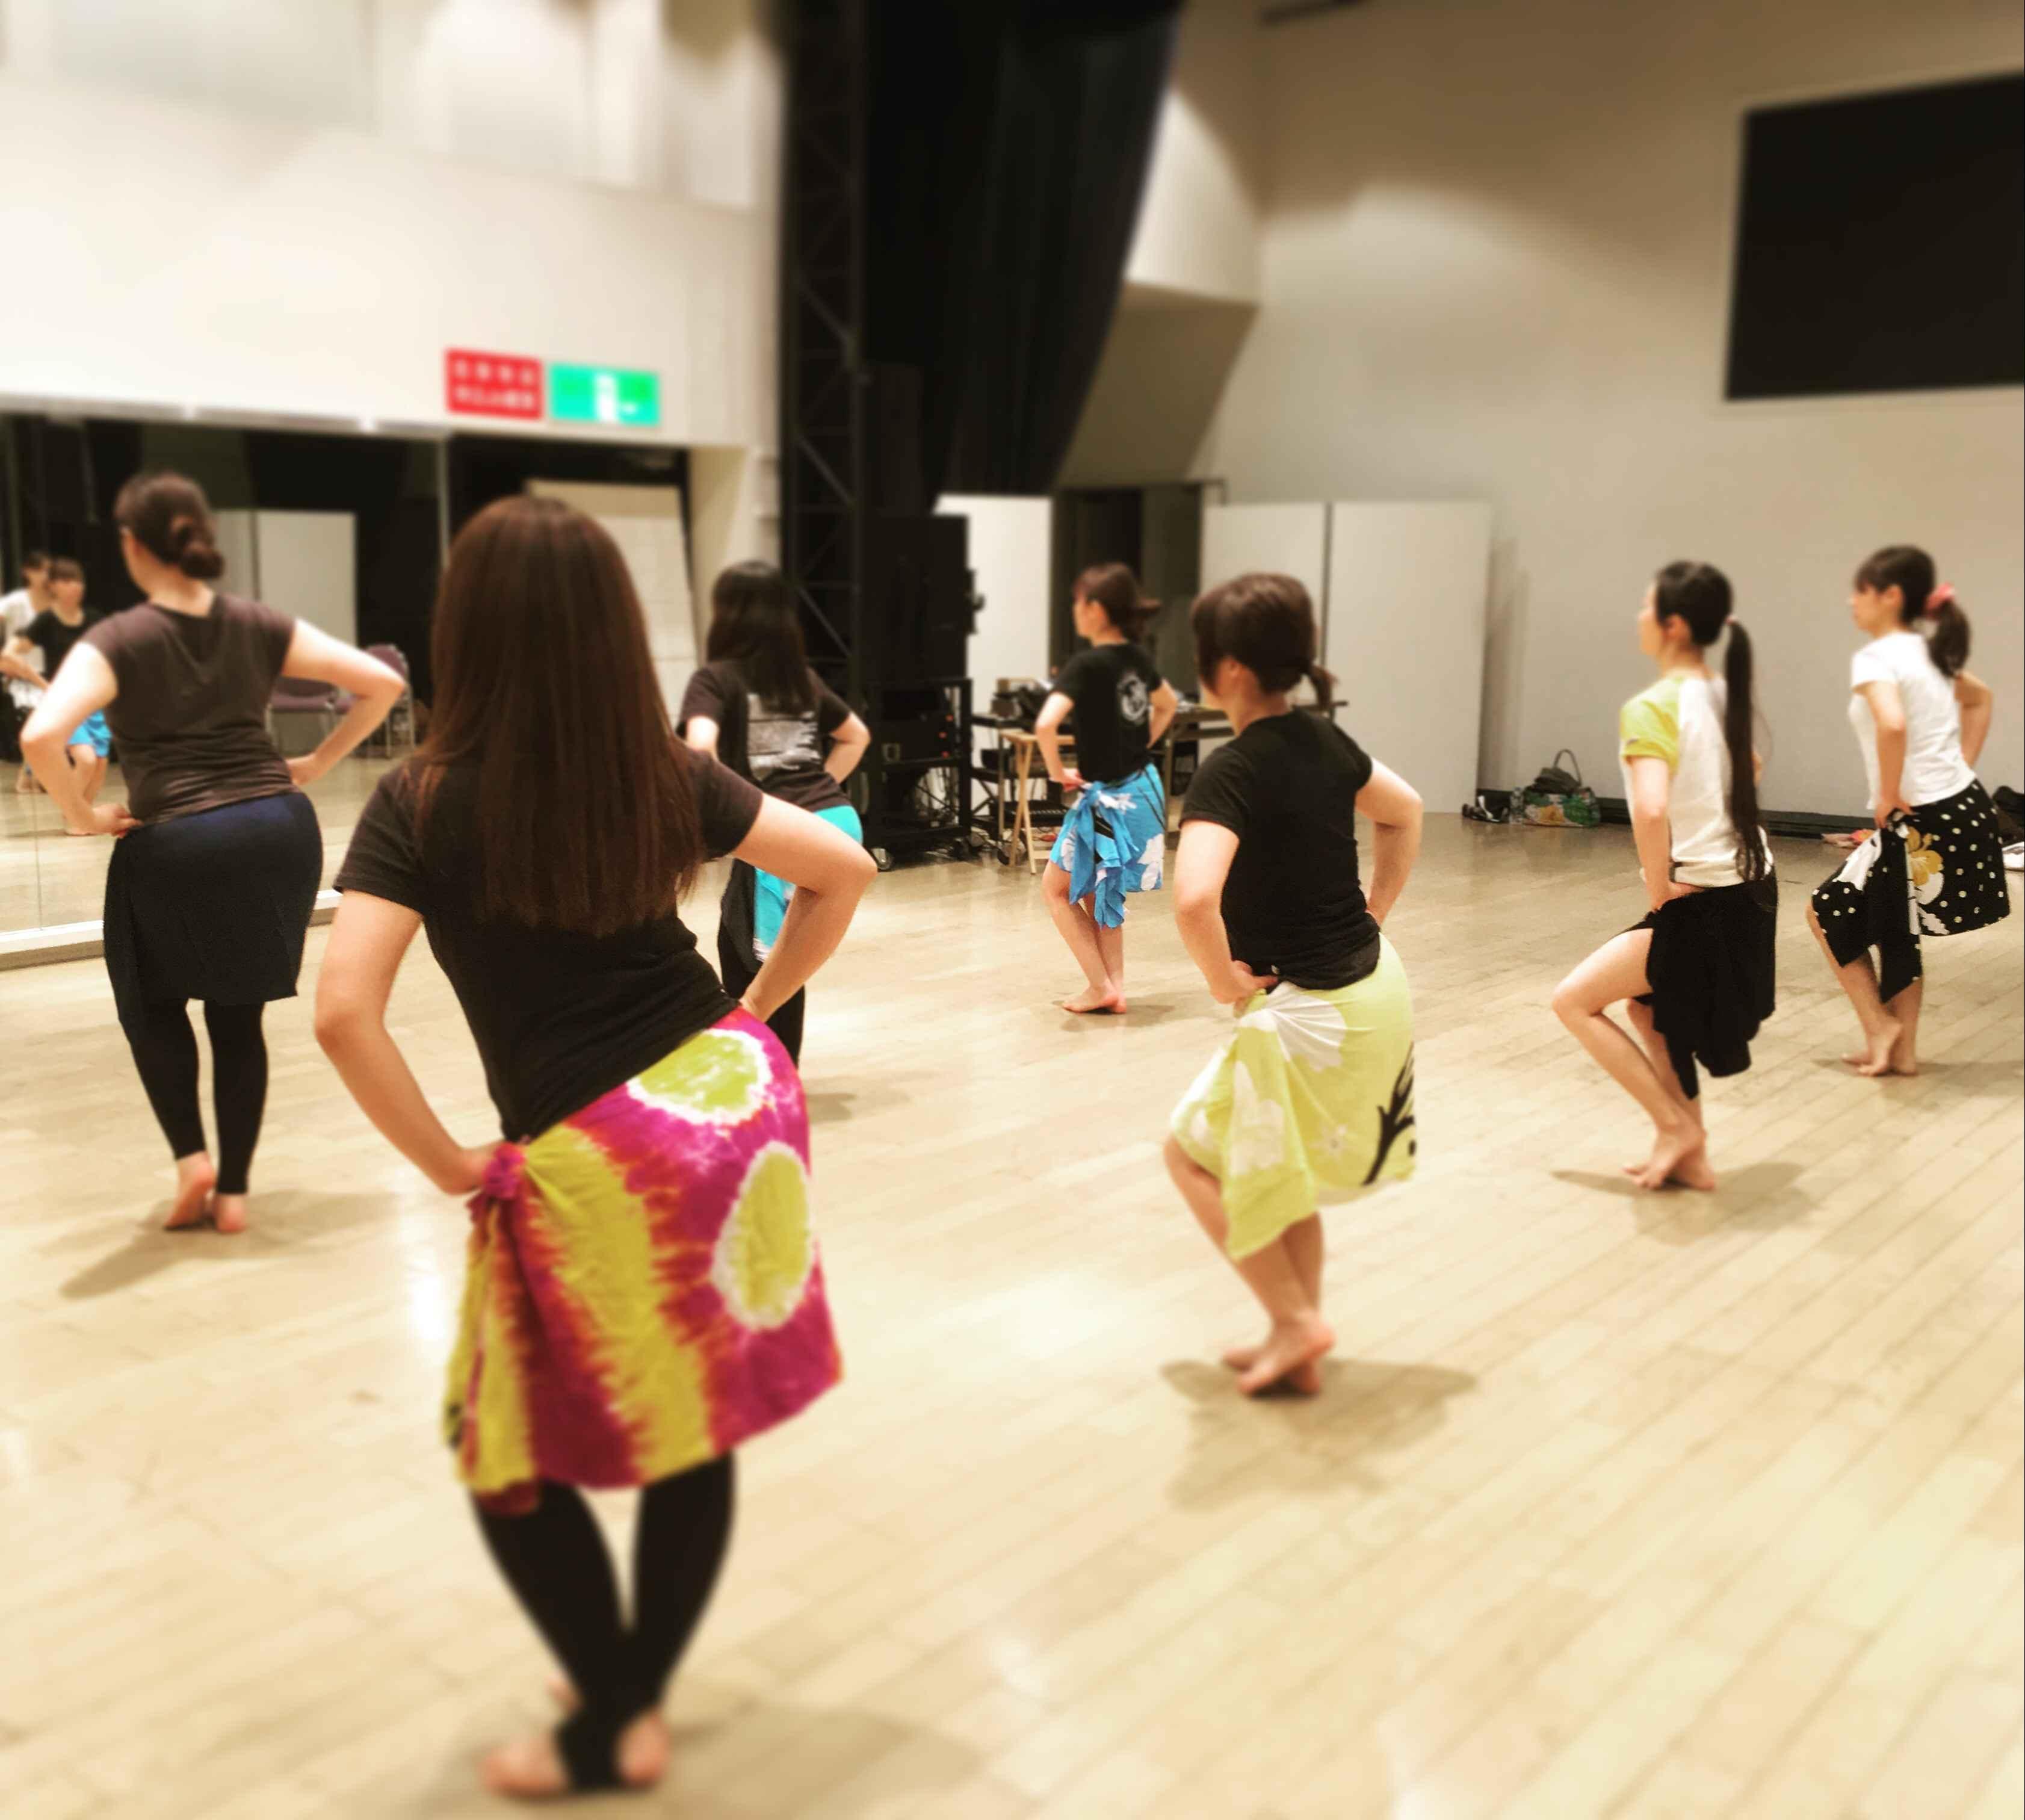 TAURUA NUI 伊勢崎教室